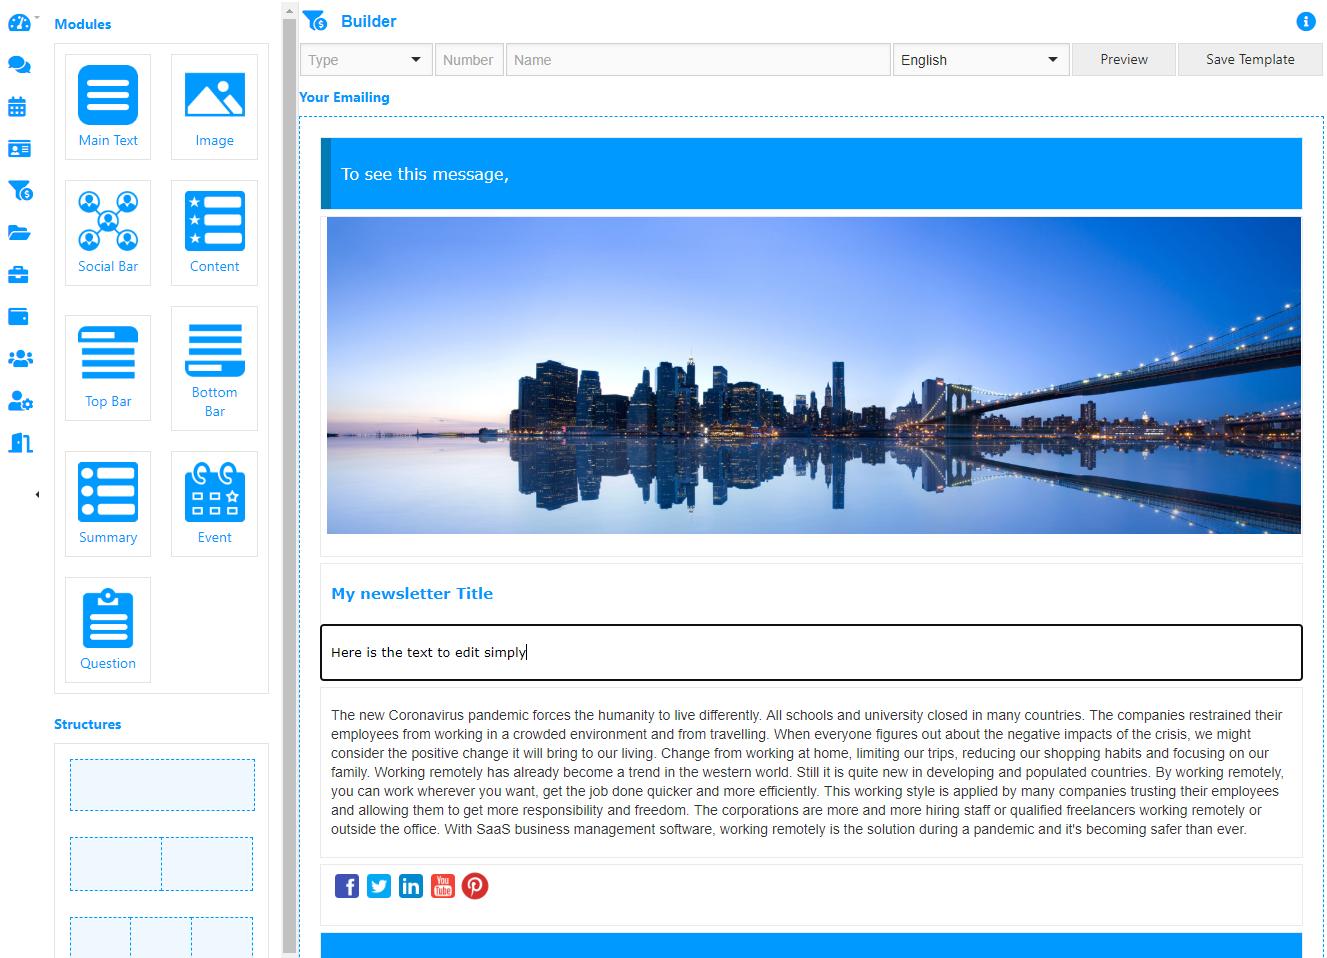 AtemisCloud | 2.Marketing | Emailing | Builder